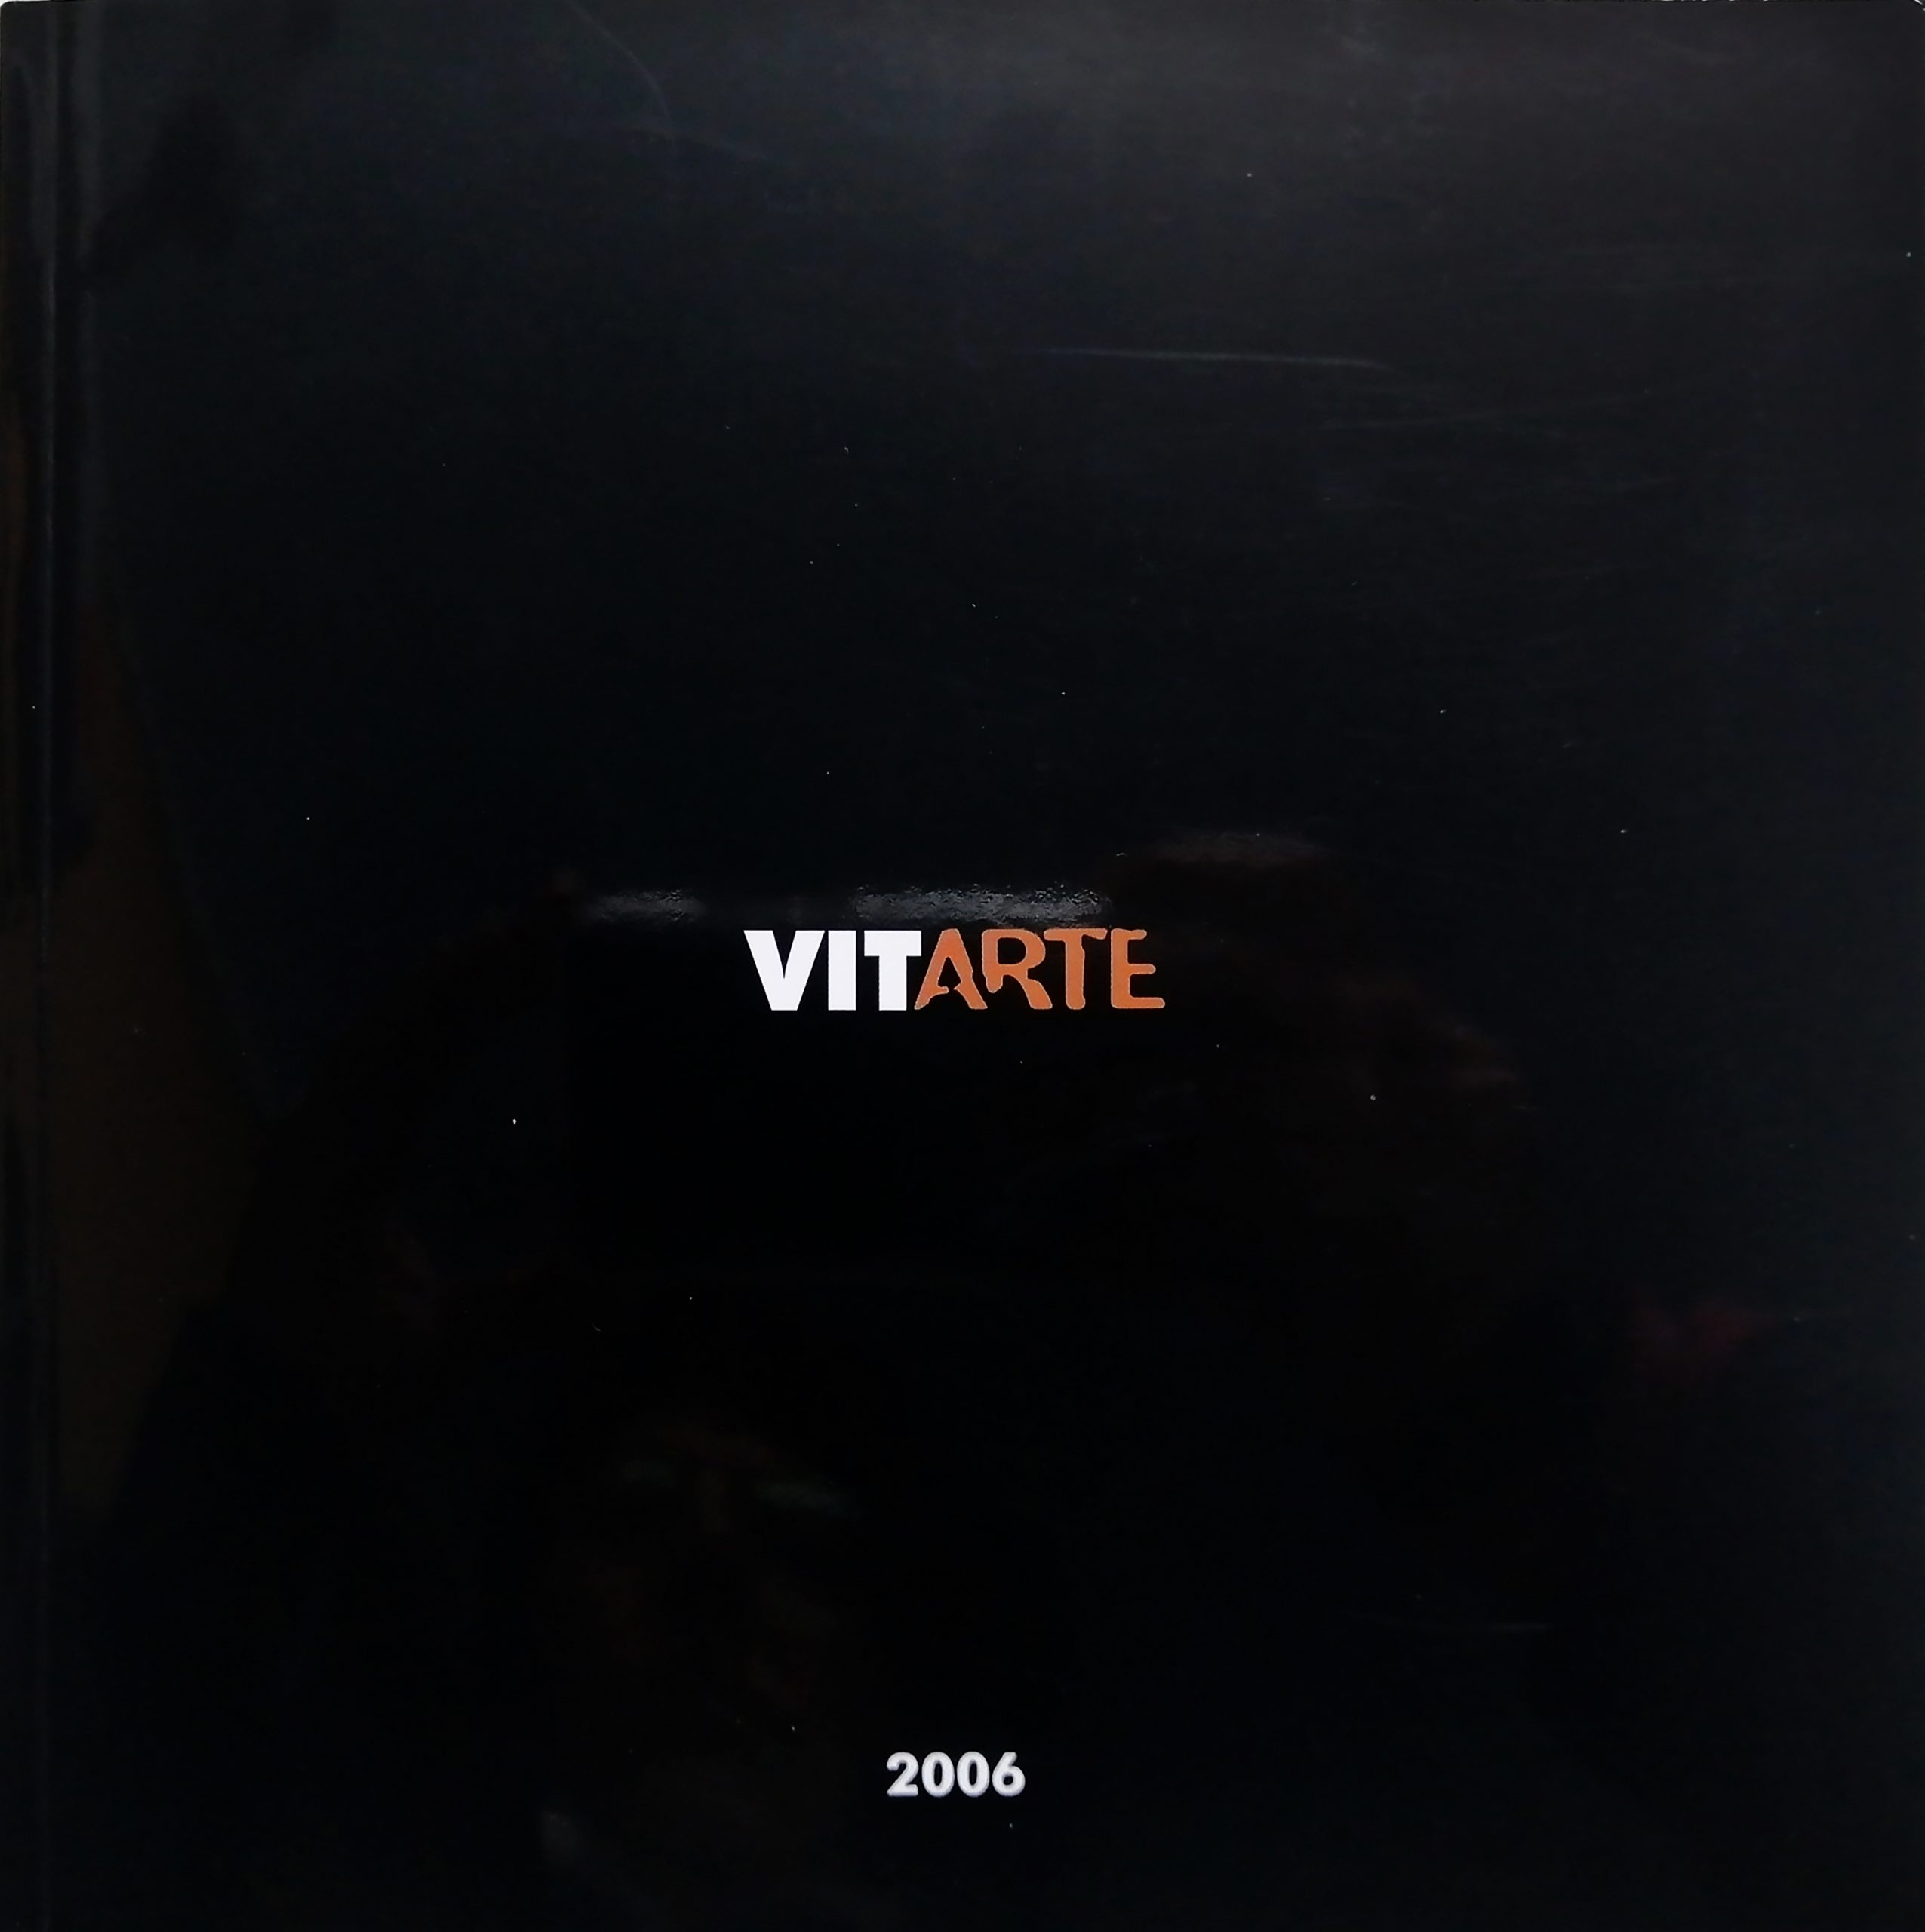 2006 Vitarte Fiera darte Viterbo scaled - Bibliography/ Catalogues